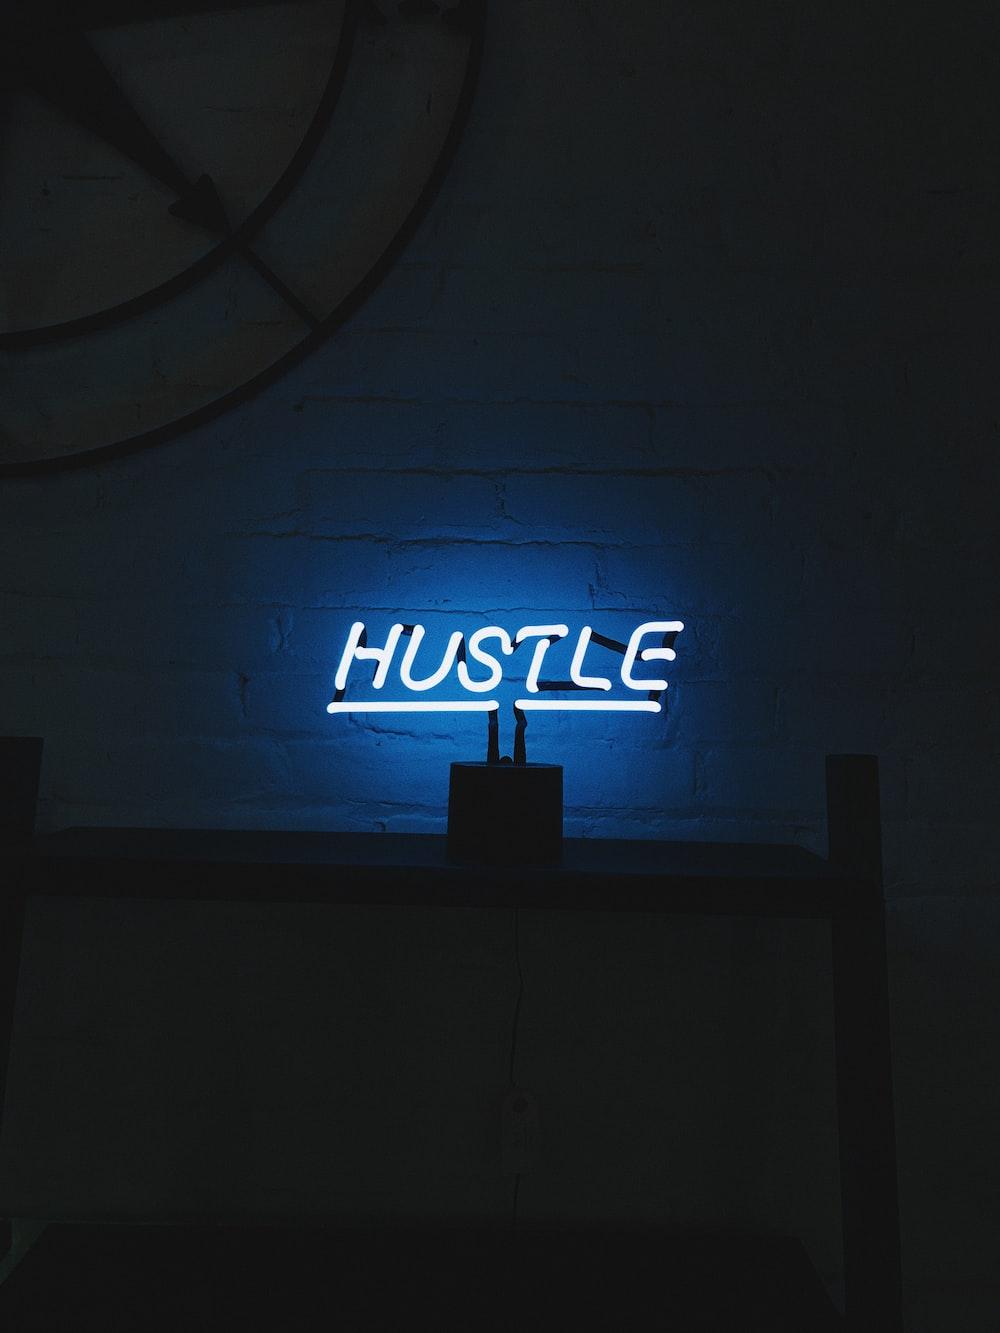 hustle LED signage turned on